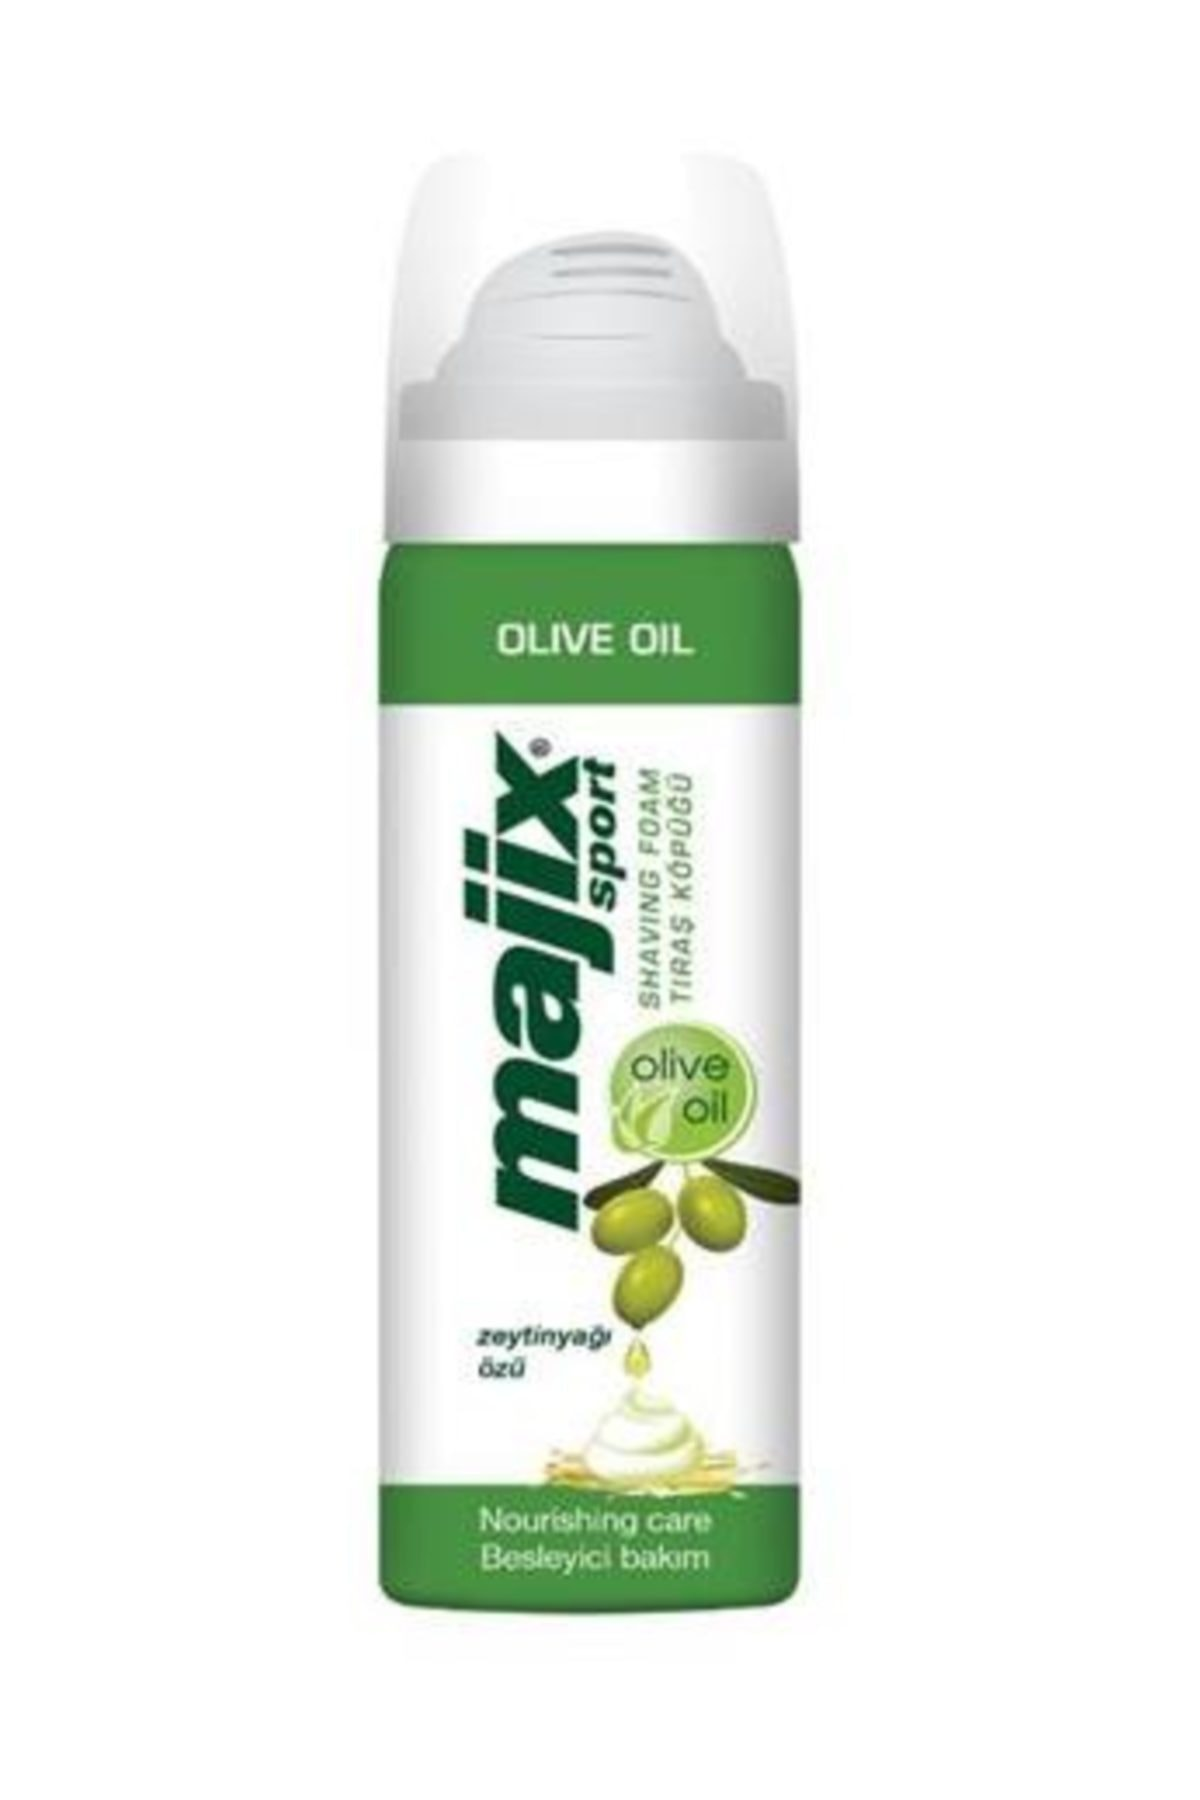 Maje Majix Sport Tıraş Köpüğü Olive Oil 200 ml. 1